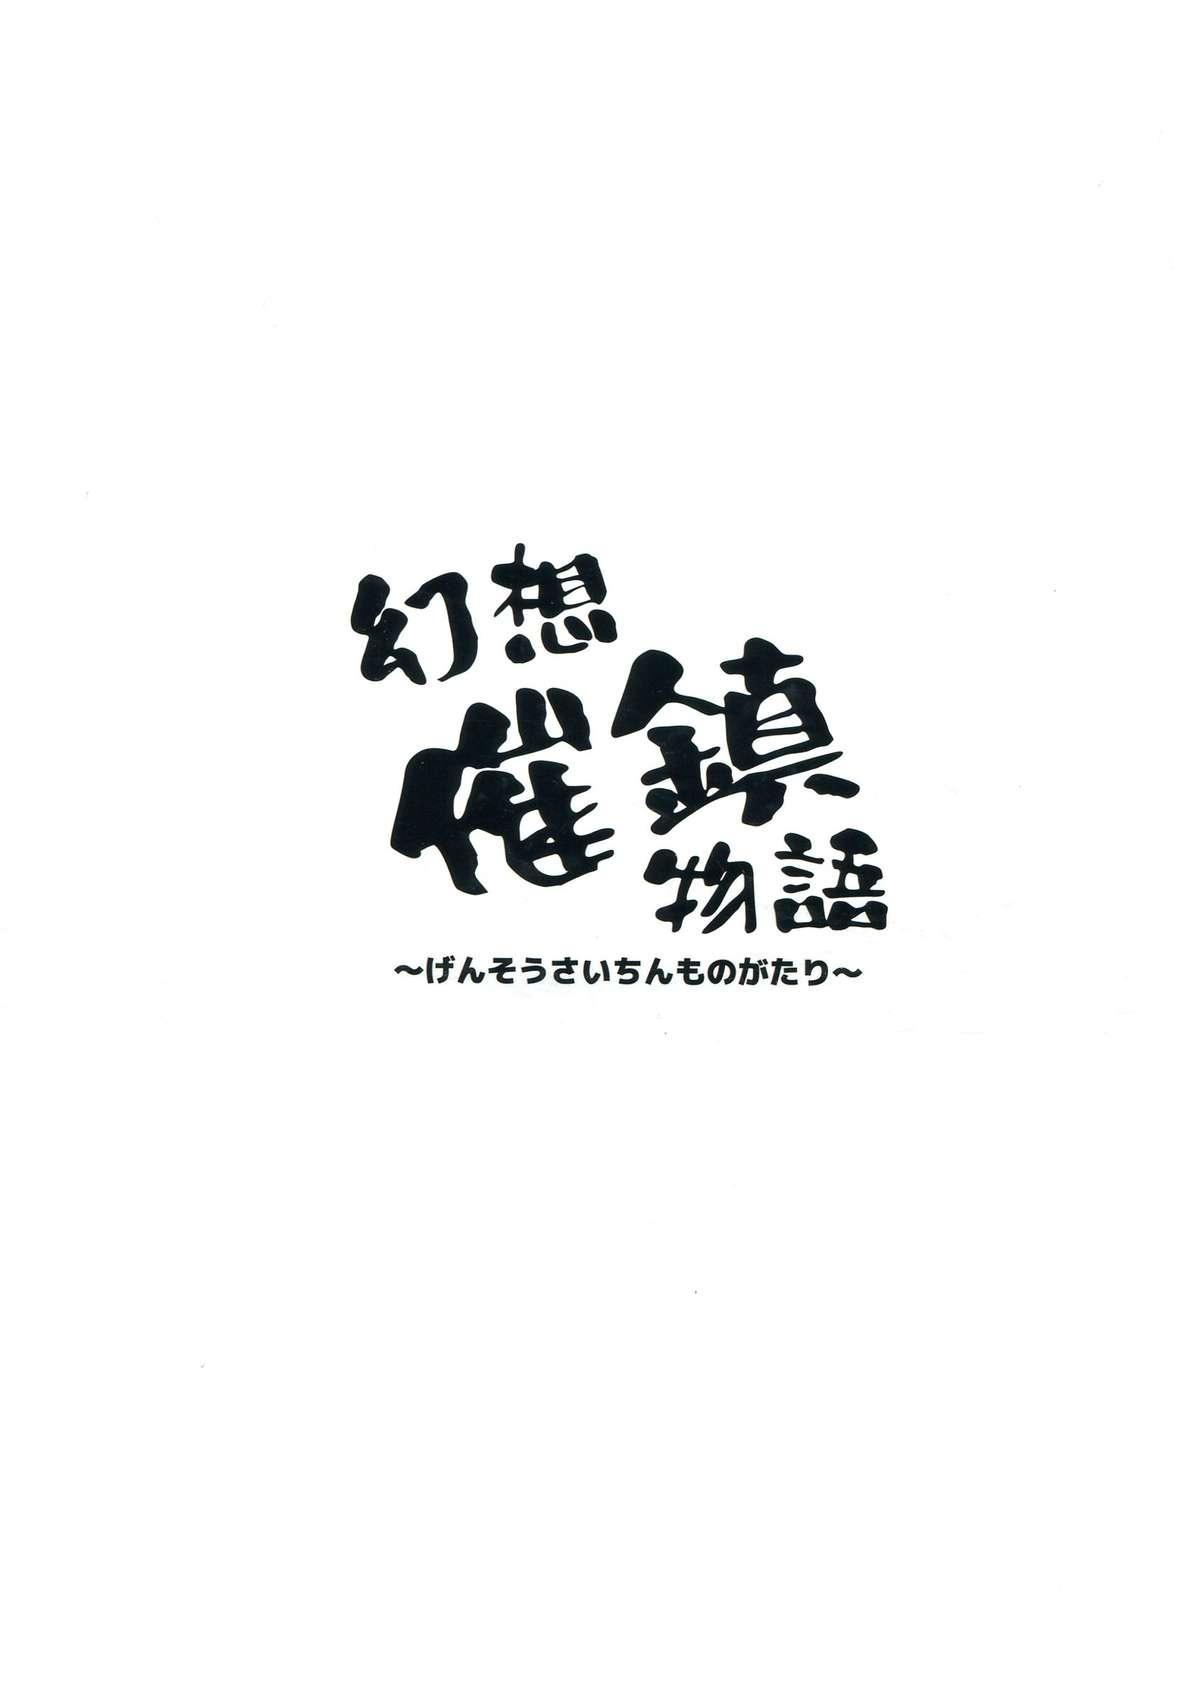 Gensou Saichin Monogatari 1